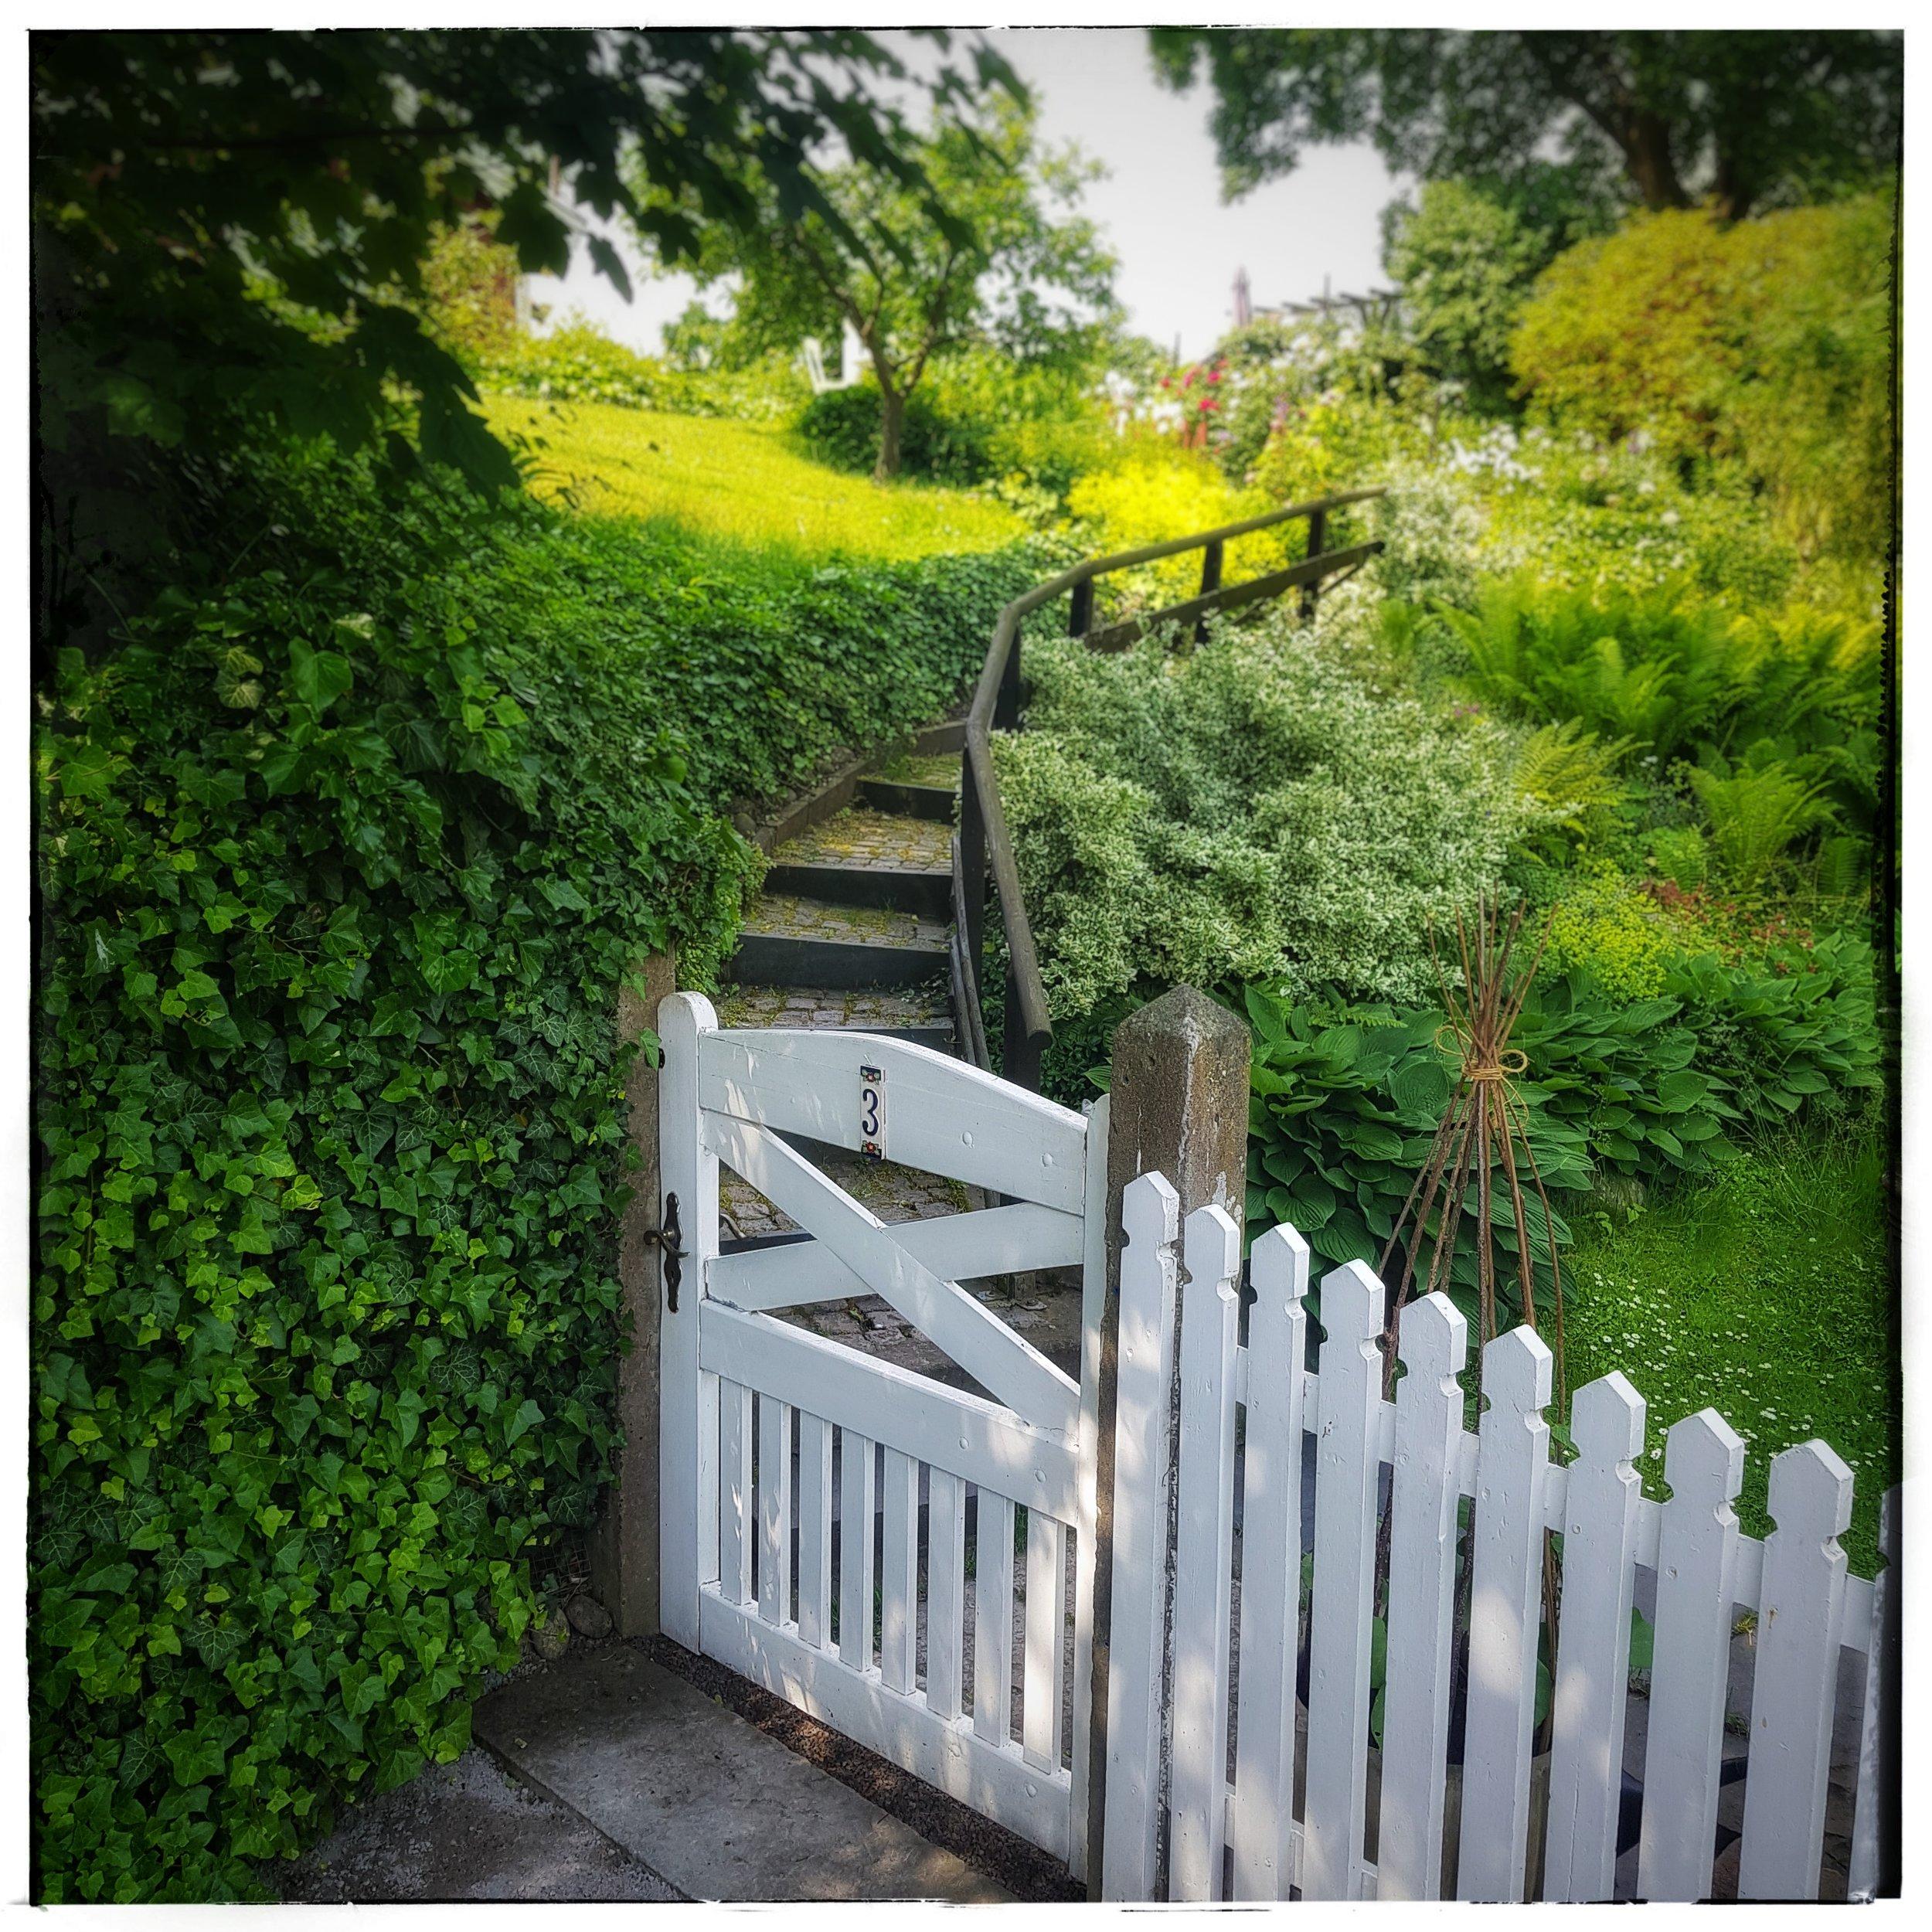 Day 170 - June 19: Garden Gate